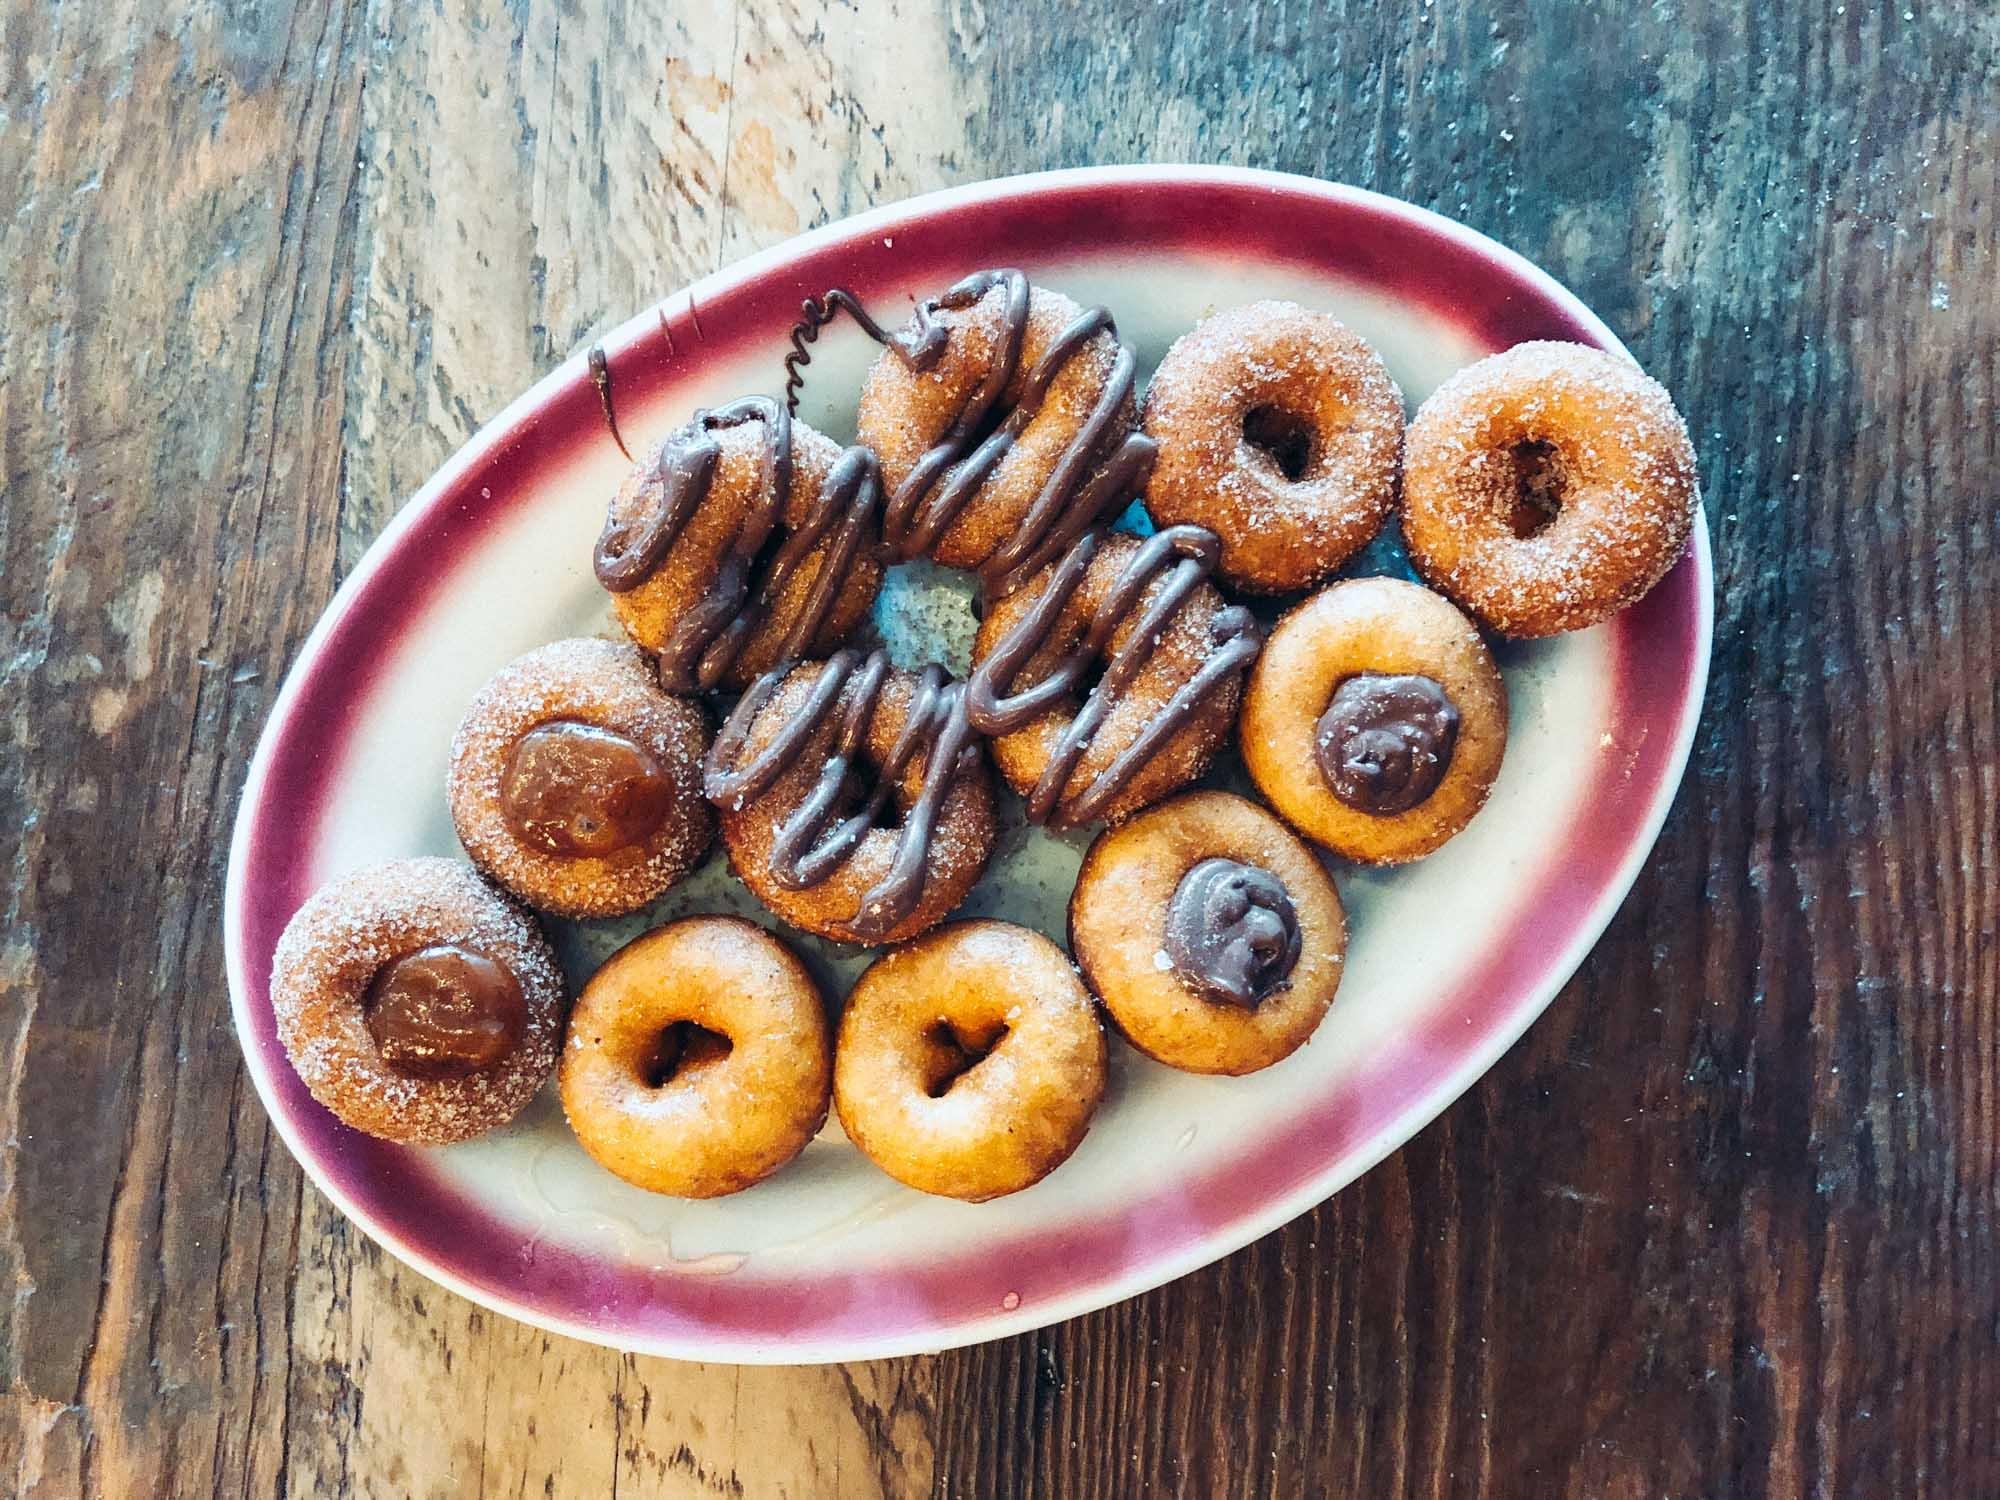 Best vegetarian restaurants in Portland - Pip's Original Donuts